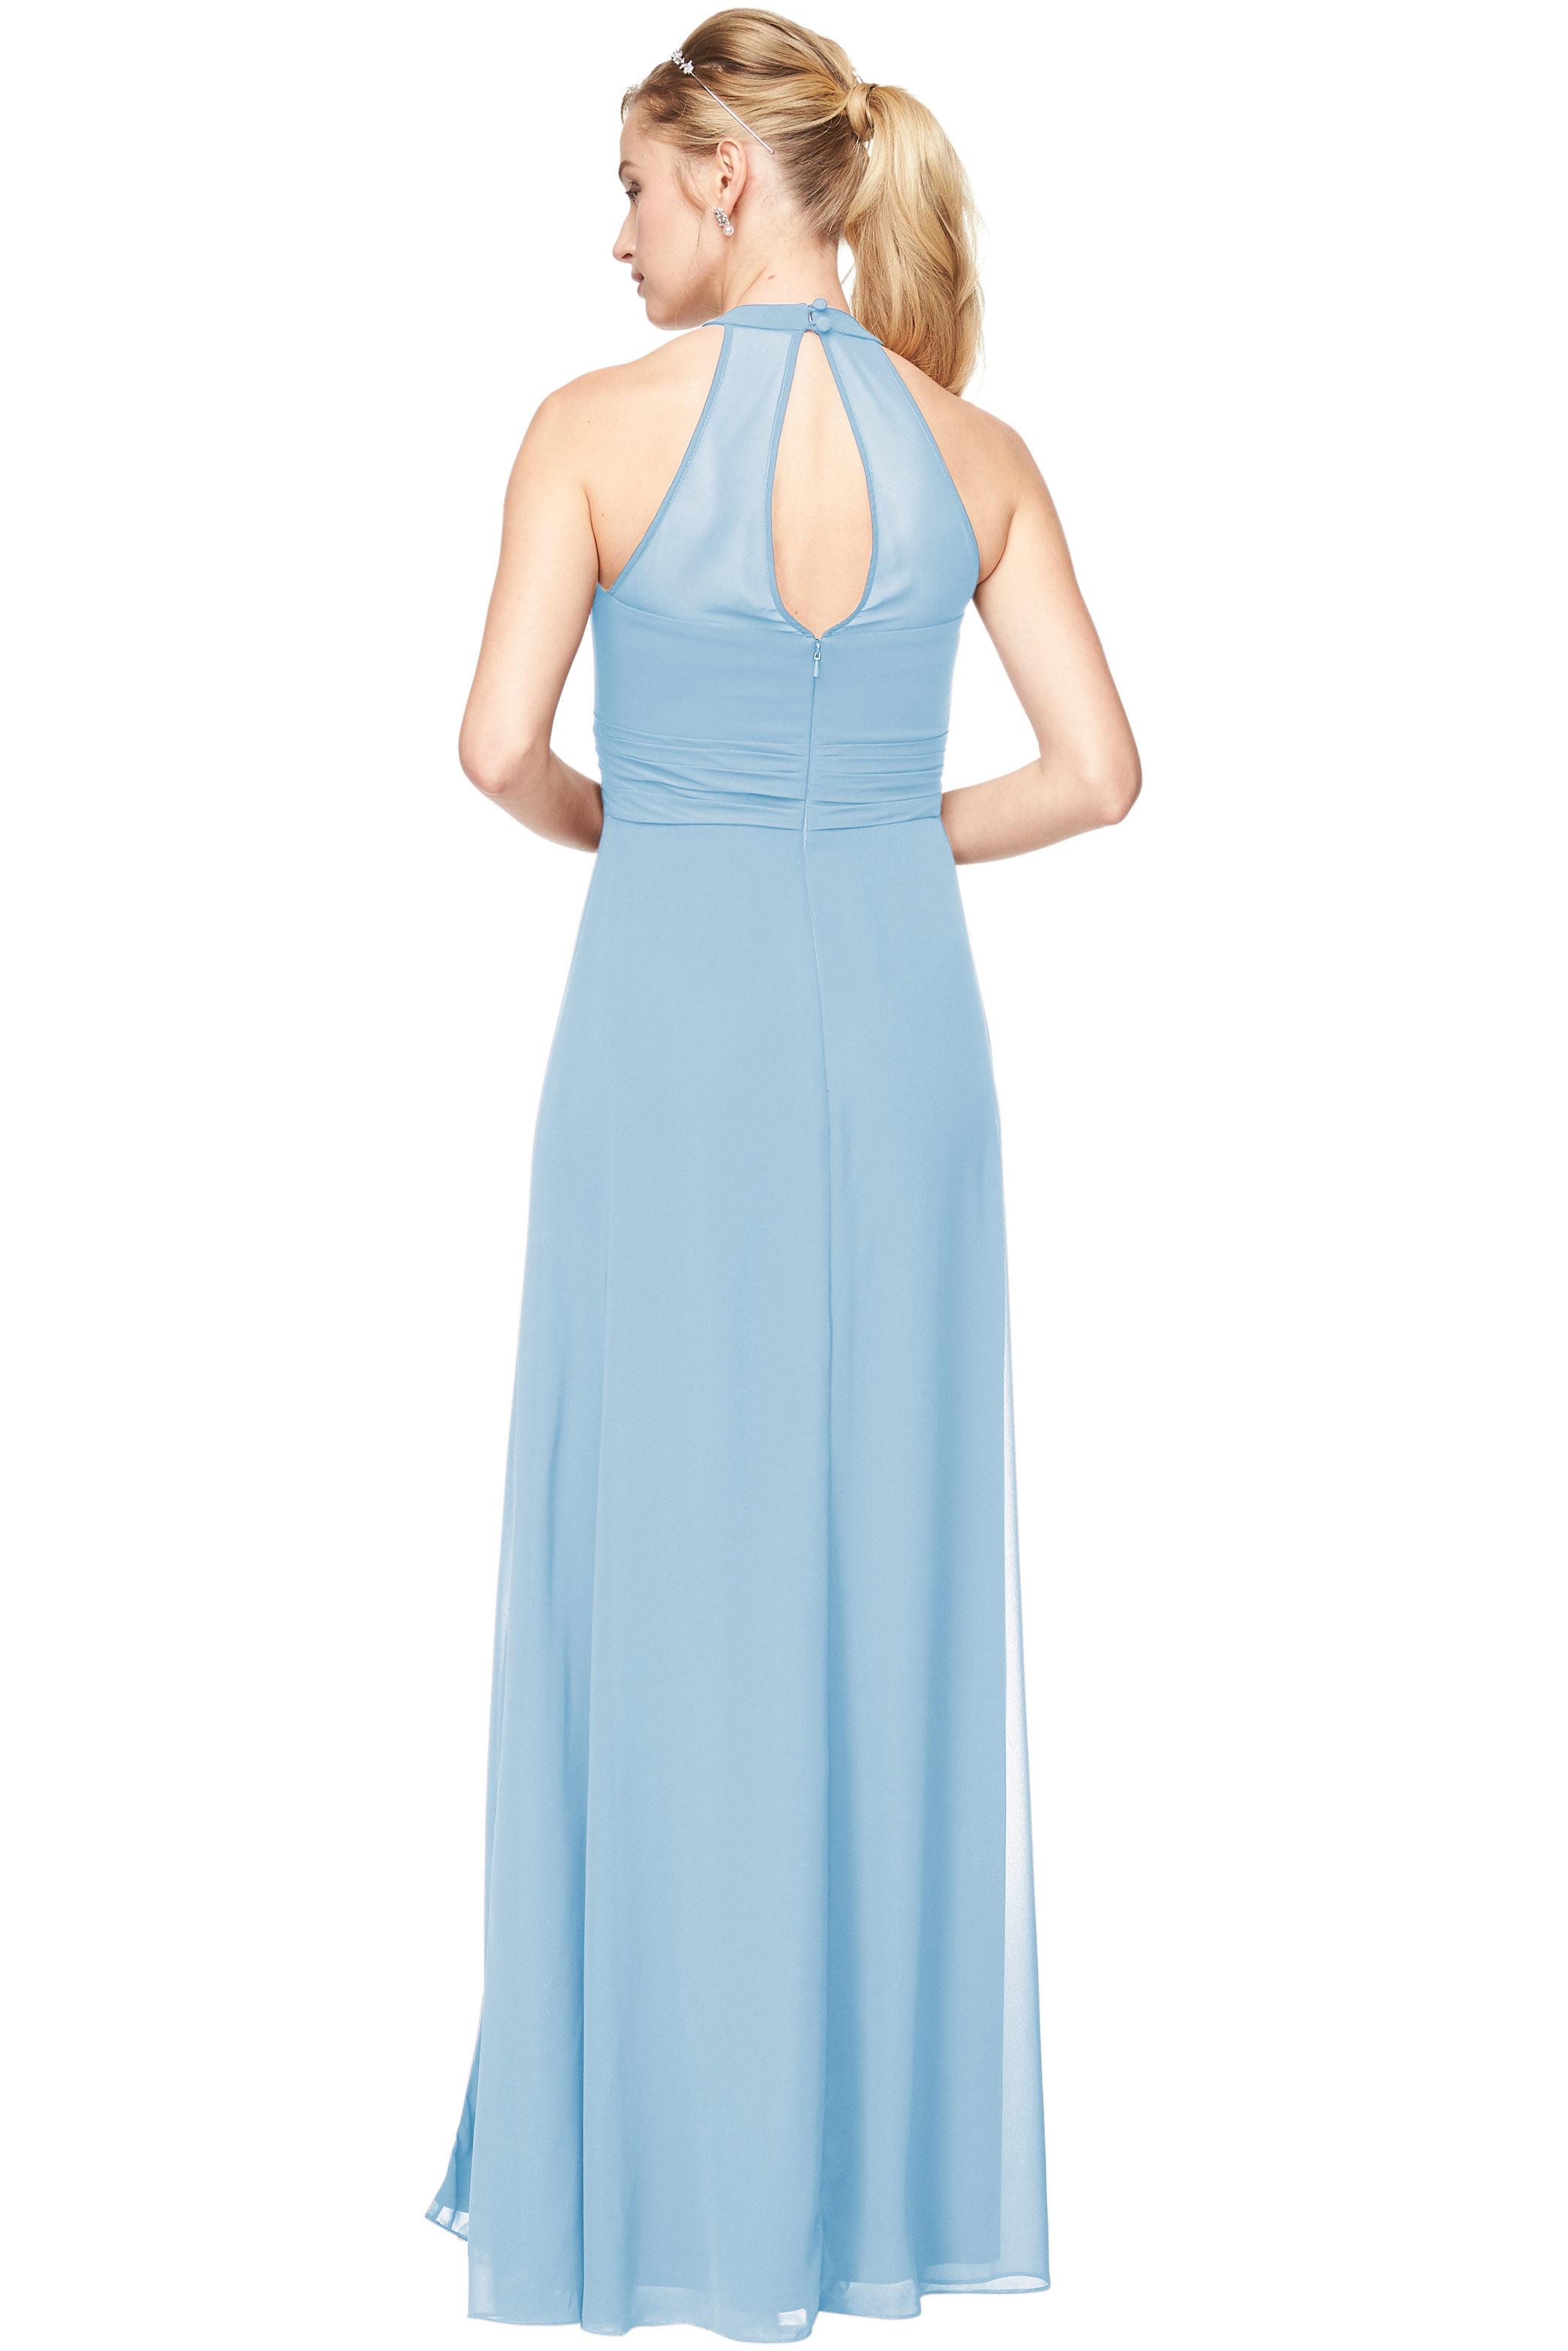 Bill Levkoff CAPRI Chiffon V-Neck A-Line gown, $198.00 Back